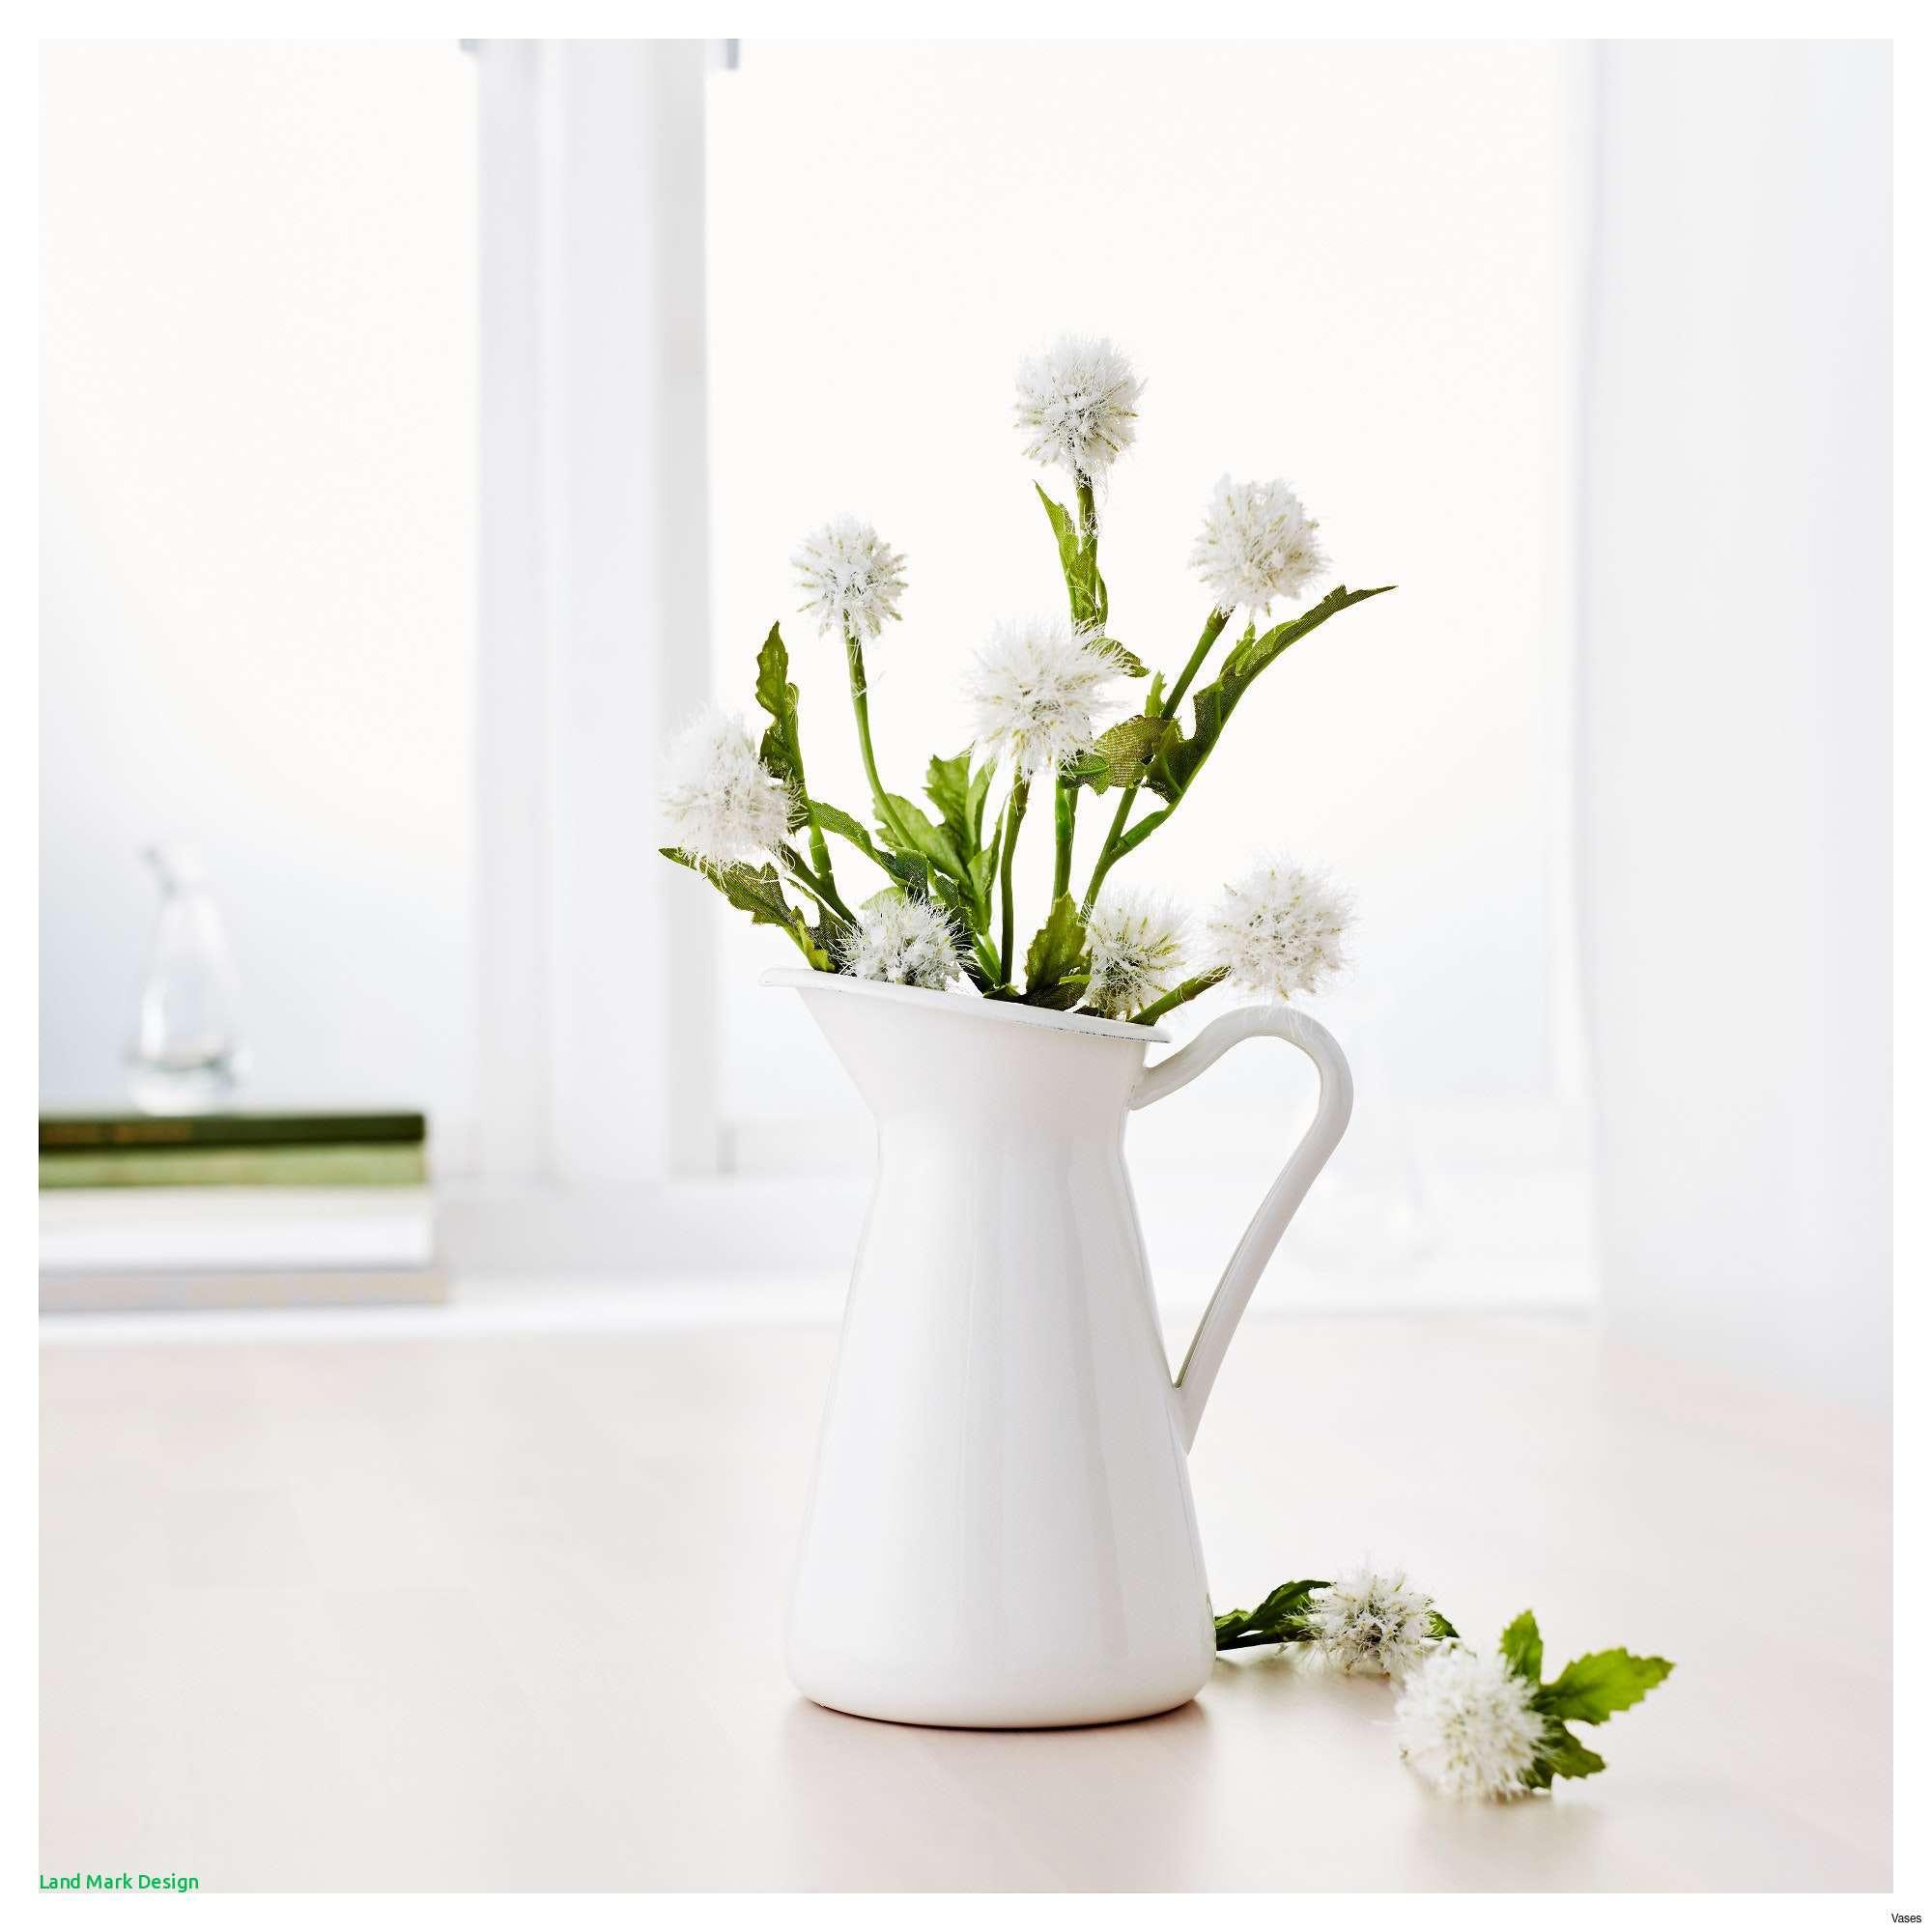 big vases amazon of large flower vase design home design regarding 0429885 pe584248 s5h vases ikea flower i 0d